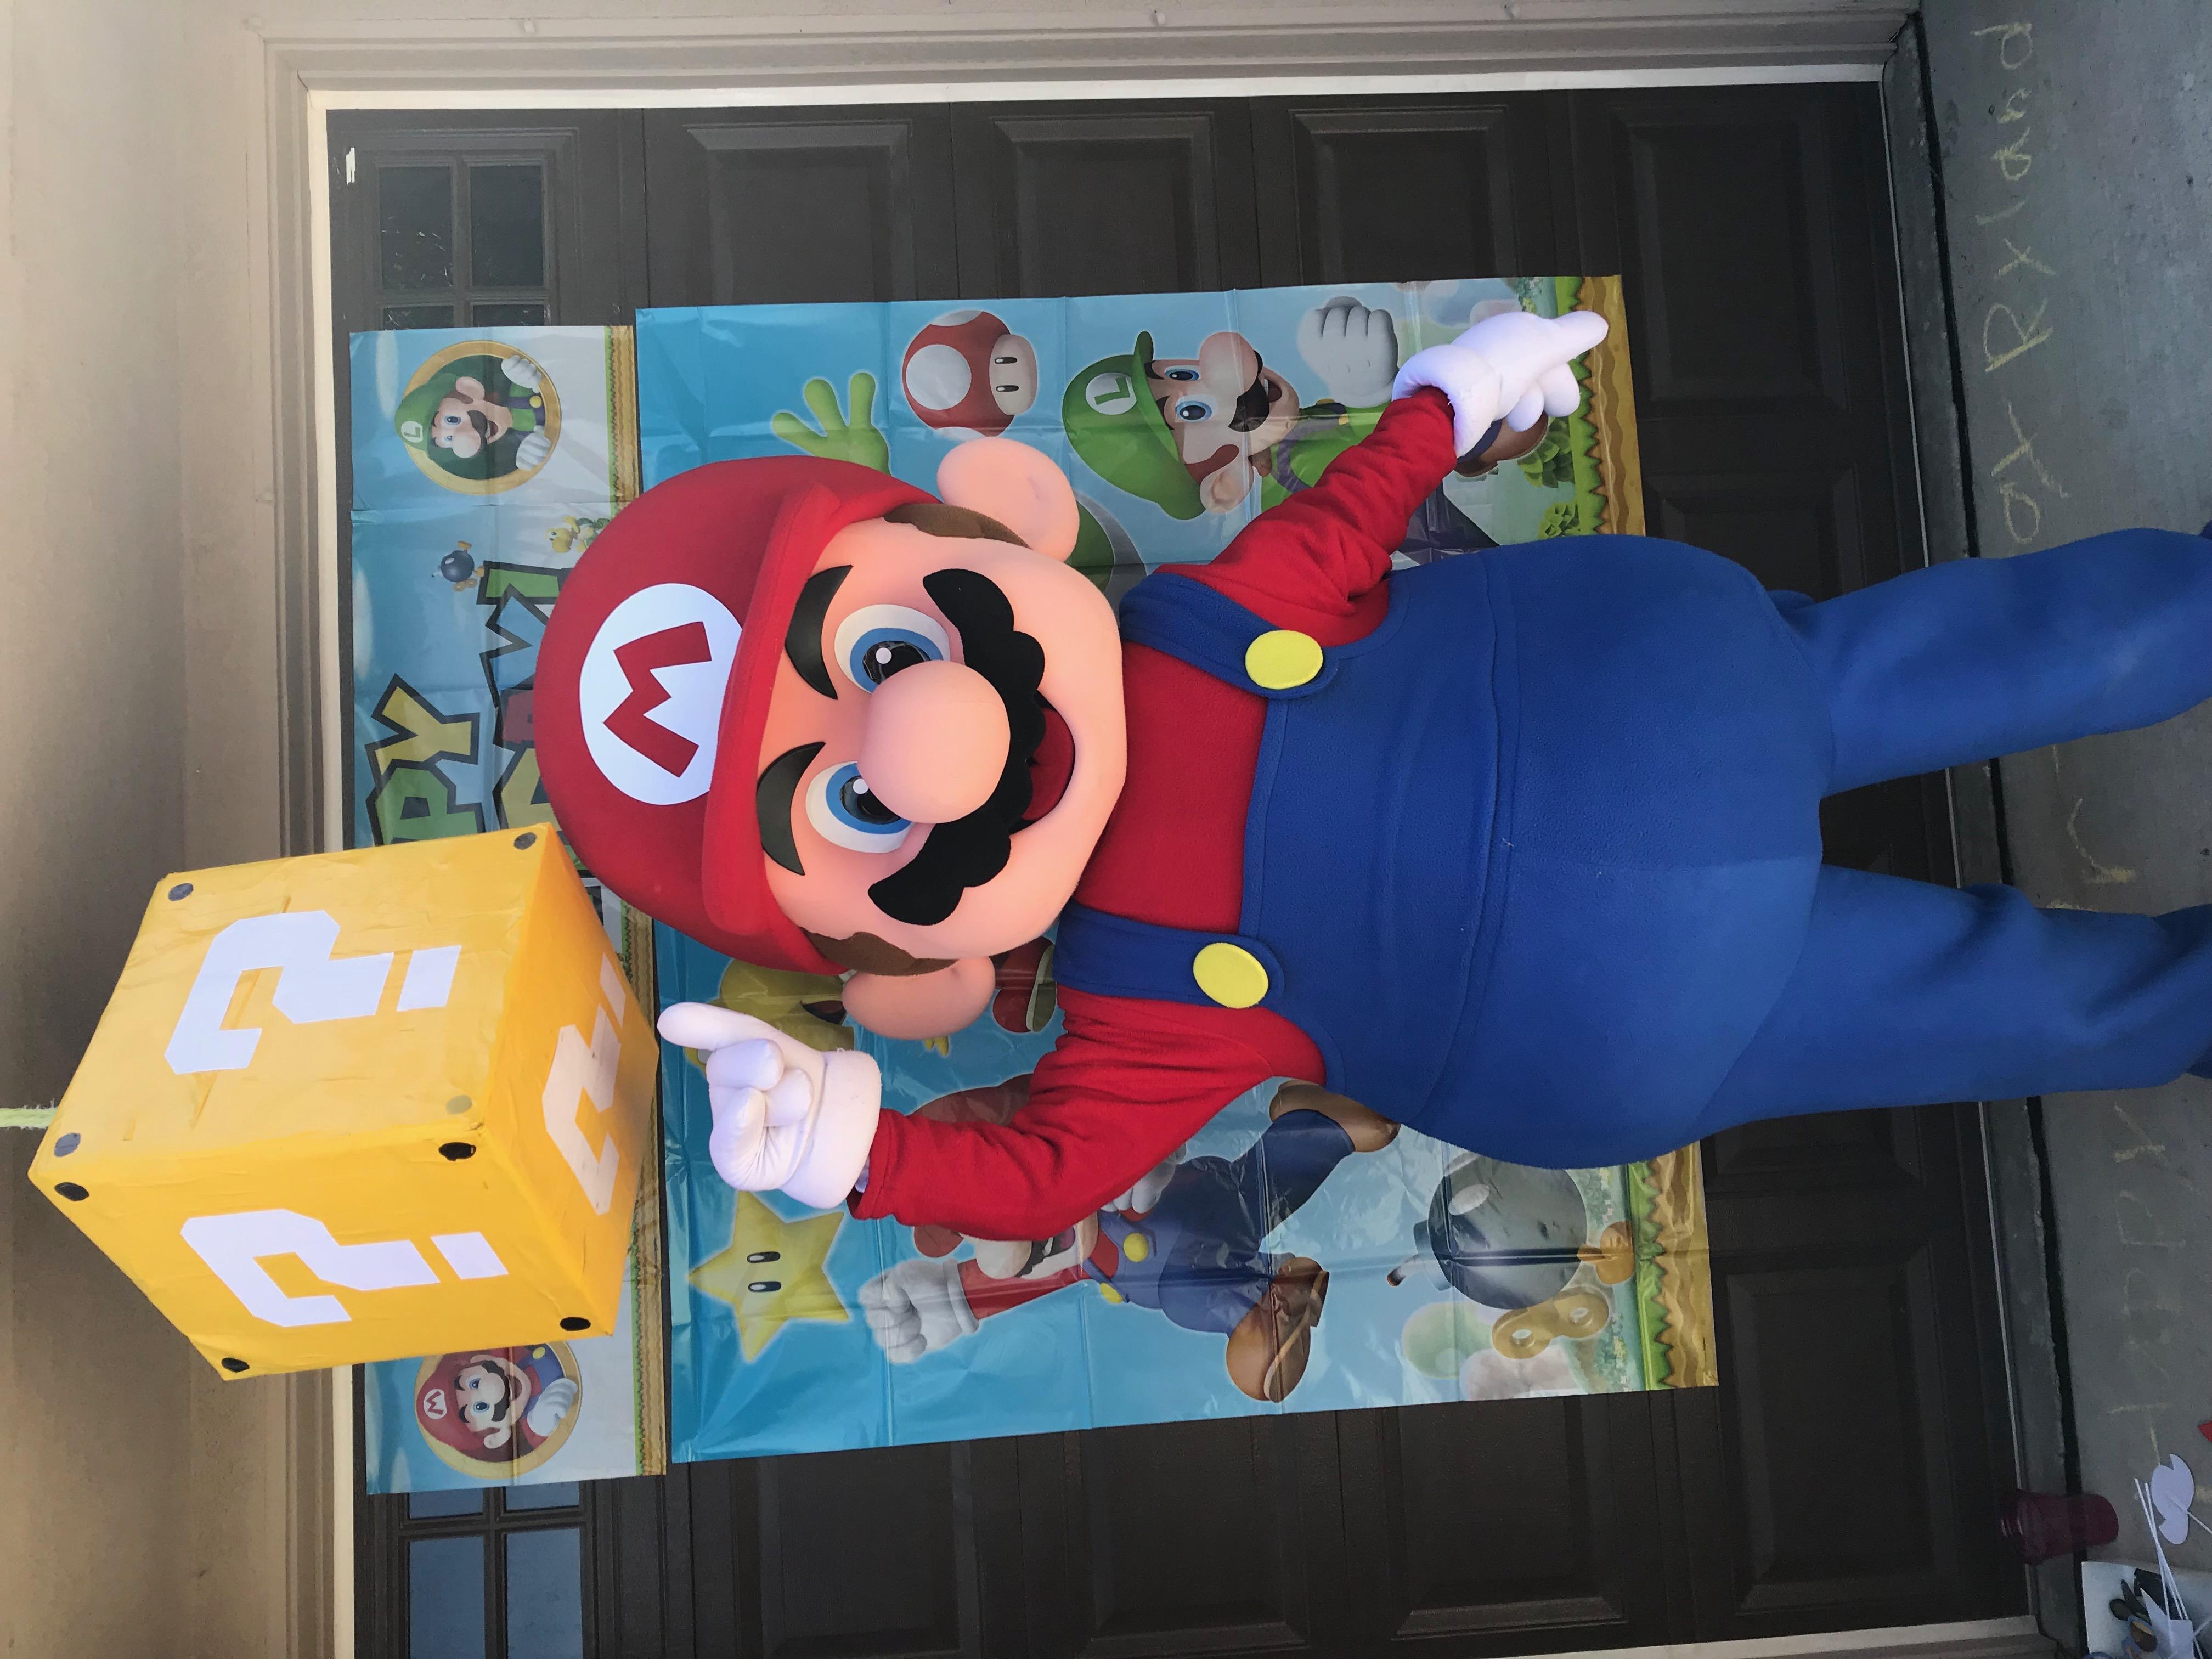 Super Mario Bros themed party